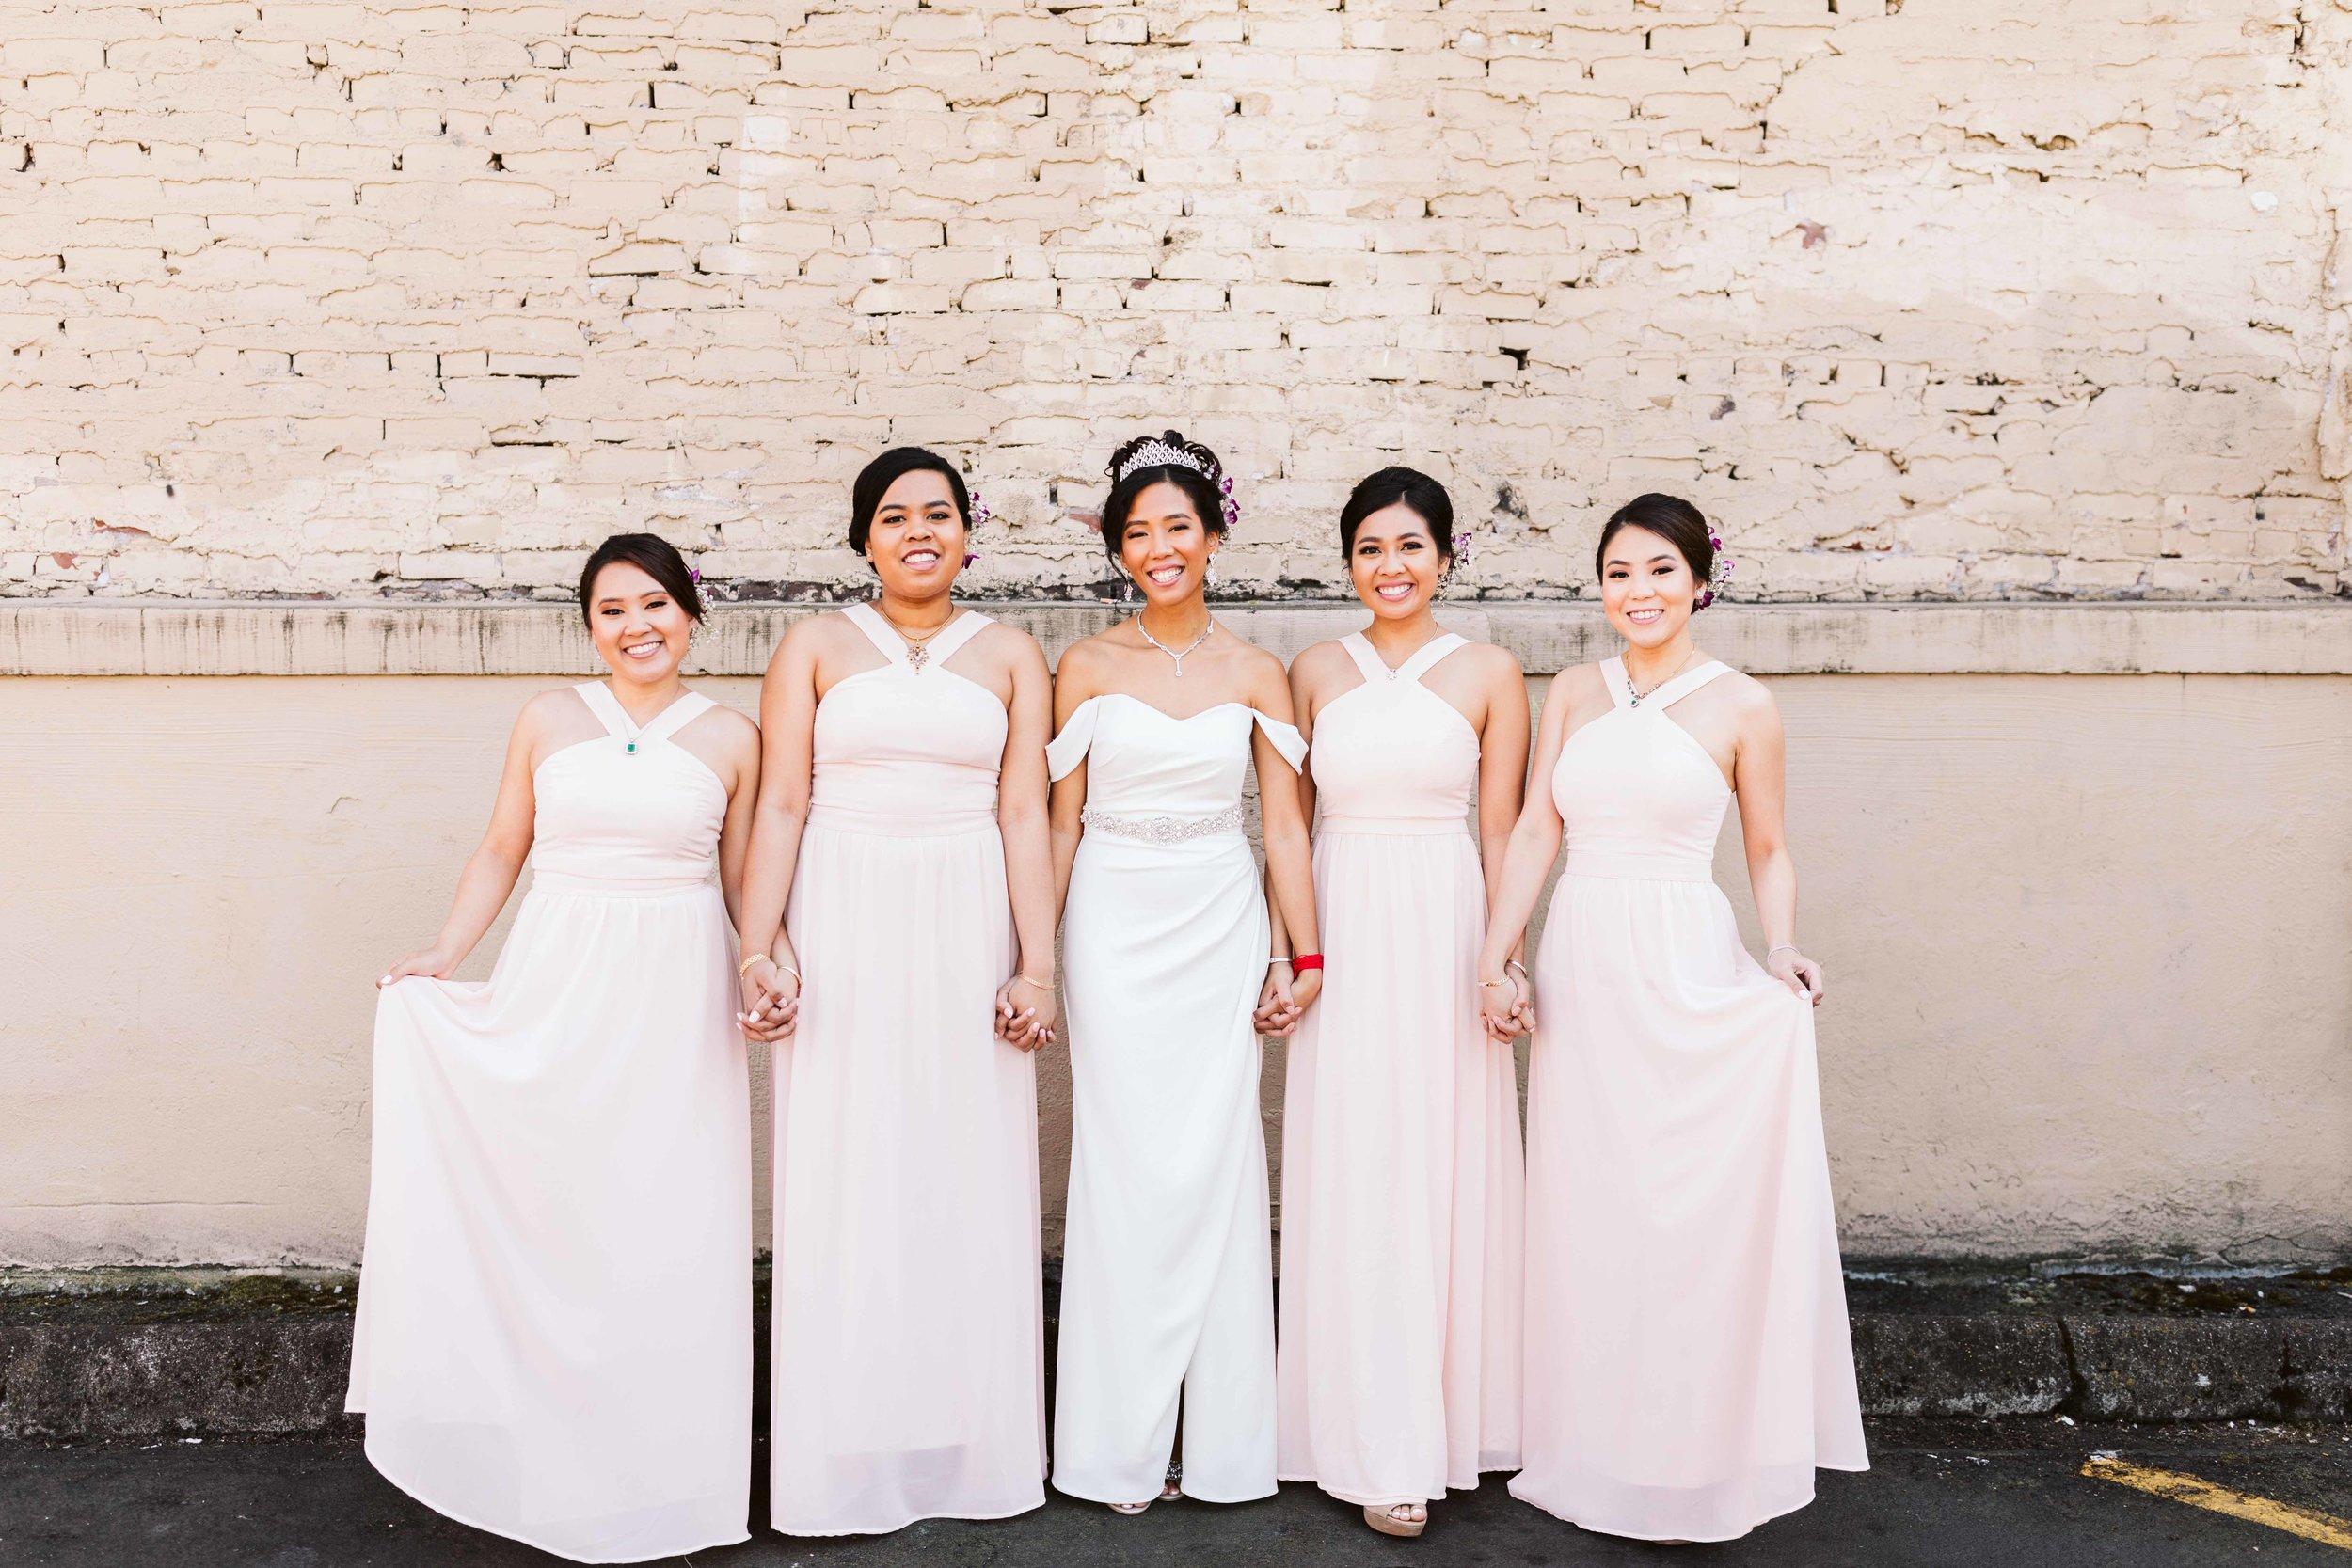 melody-ballroom-portland-wedding-72.jpg